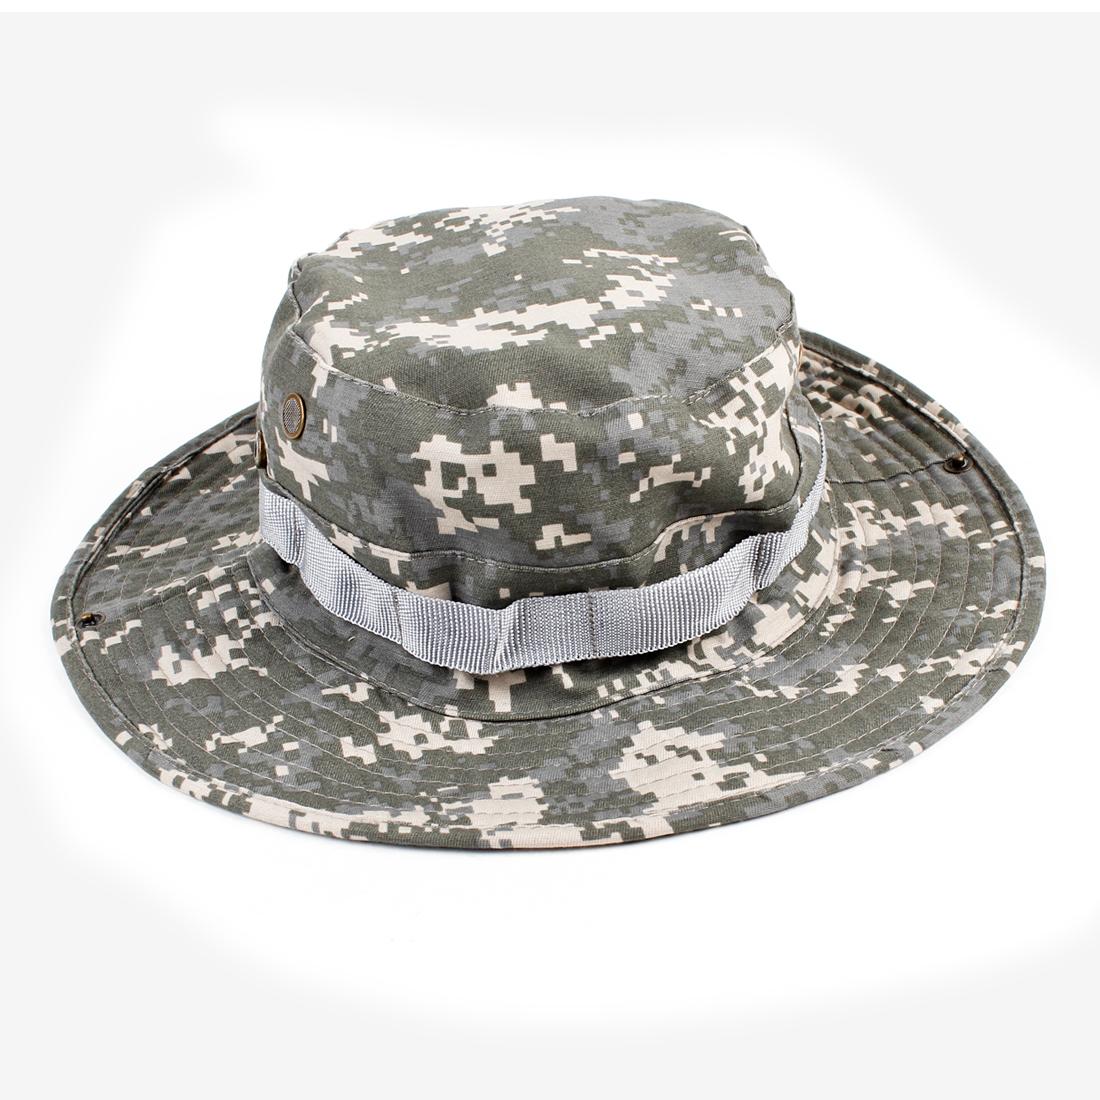 Unisex Camouflage Printed Stitch Decoration Gray Bucket Hat Cap